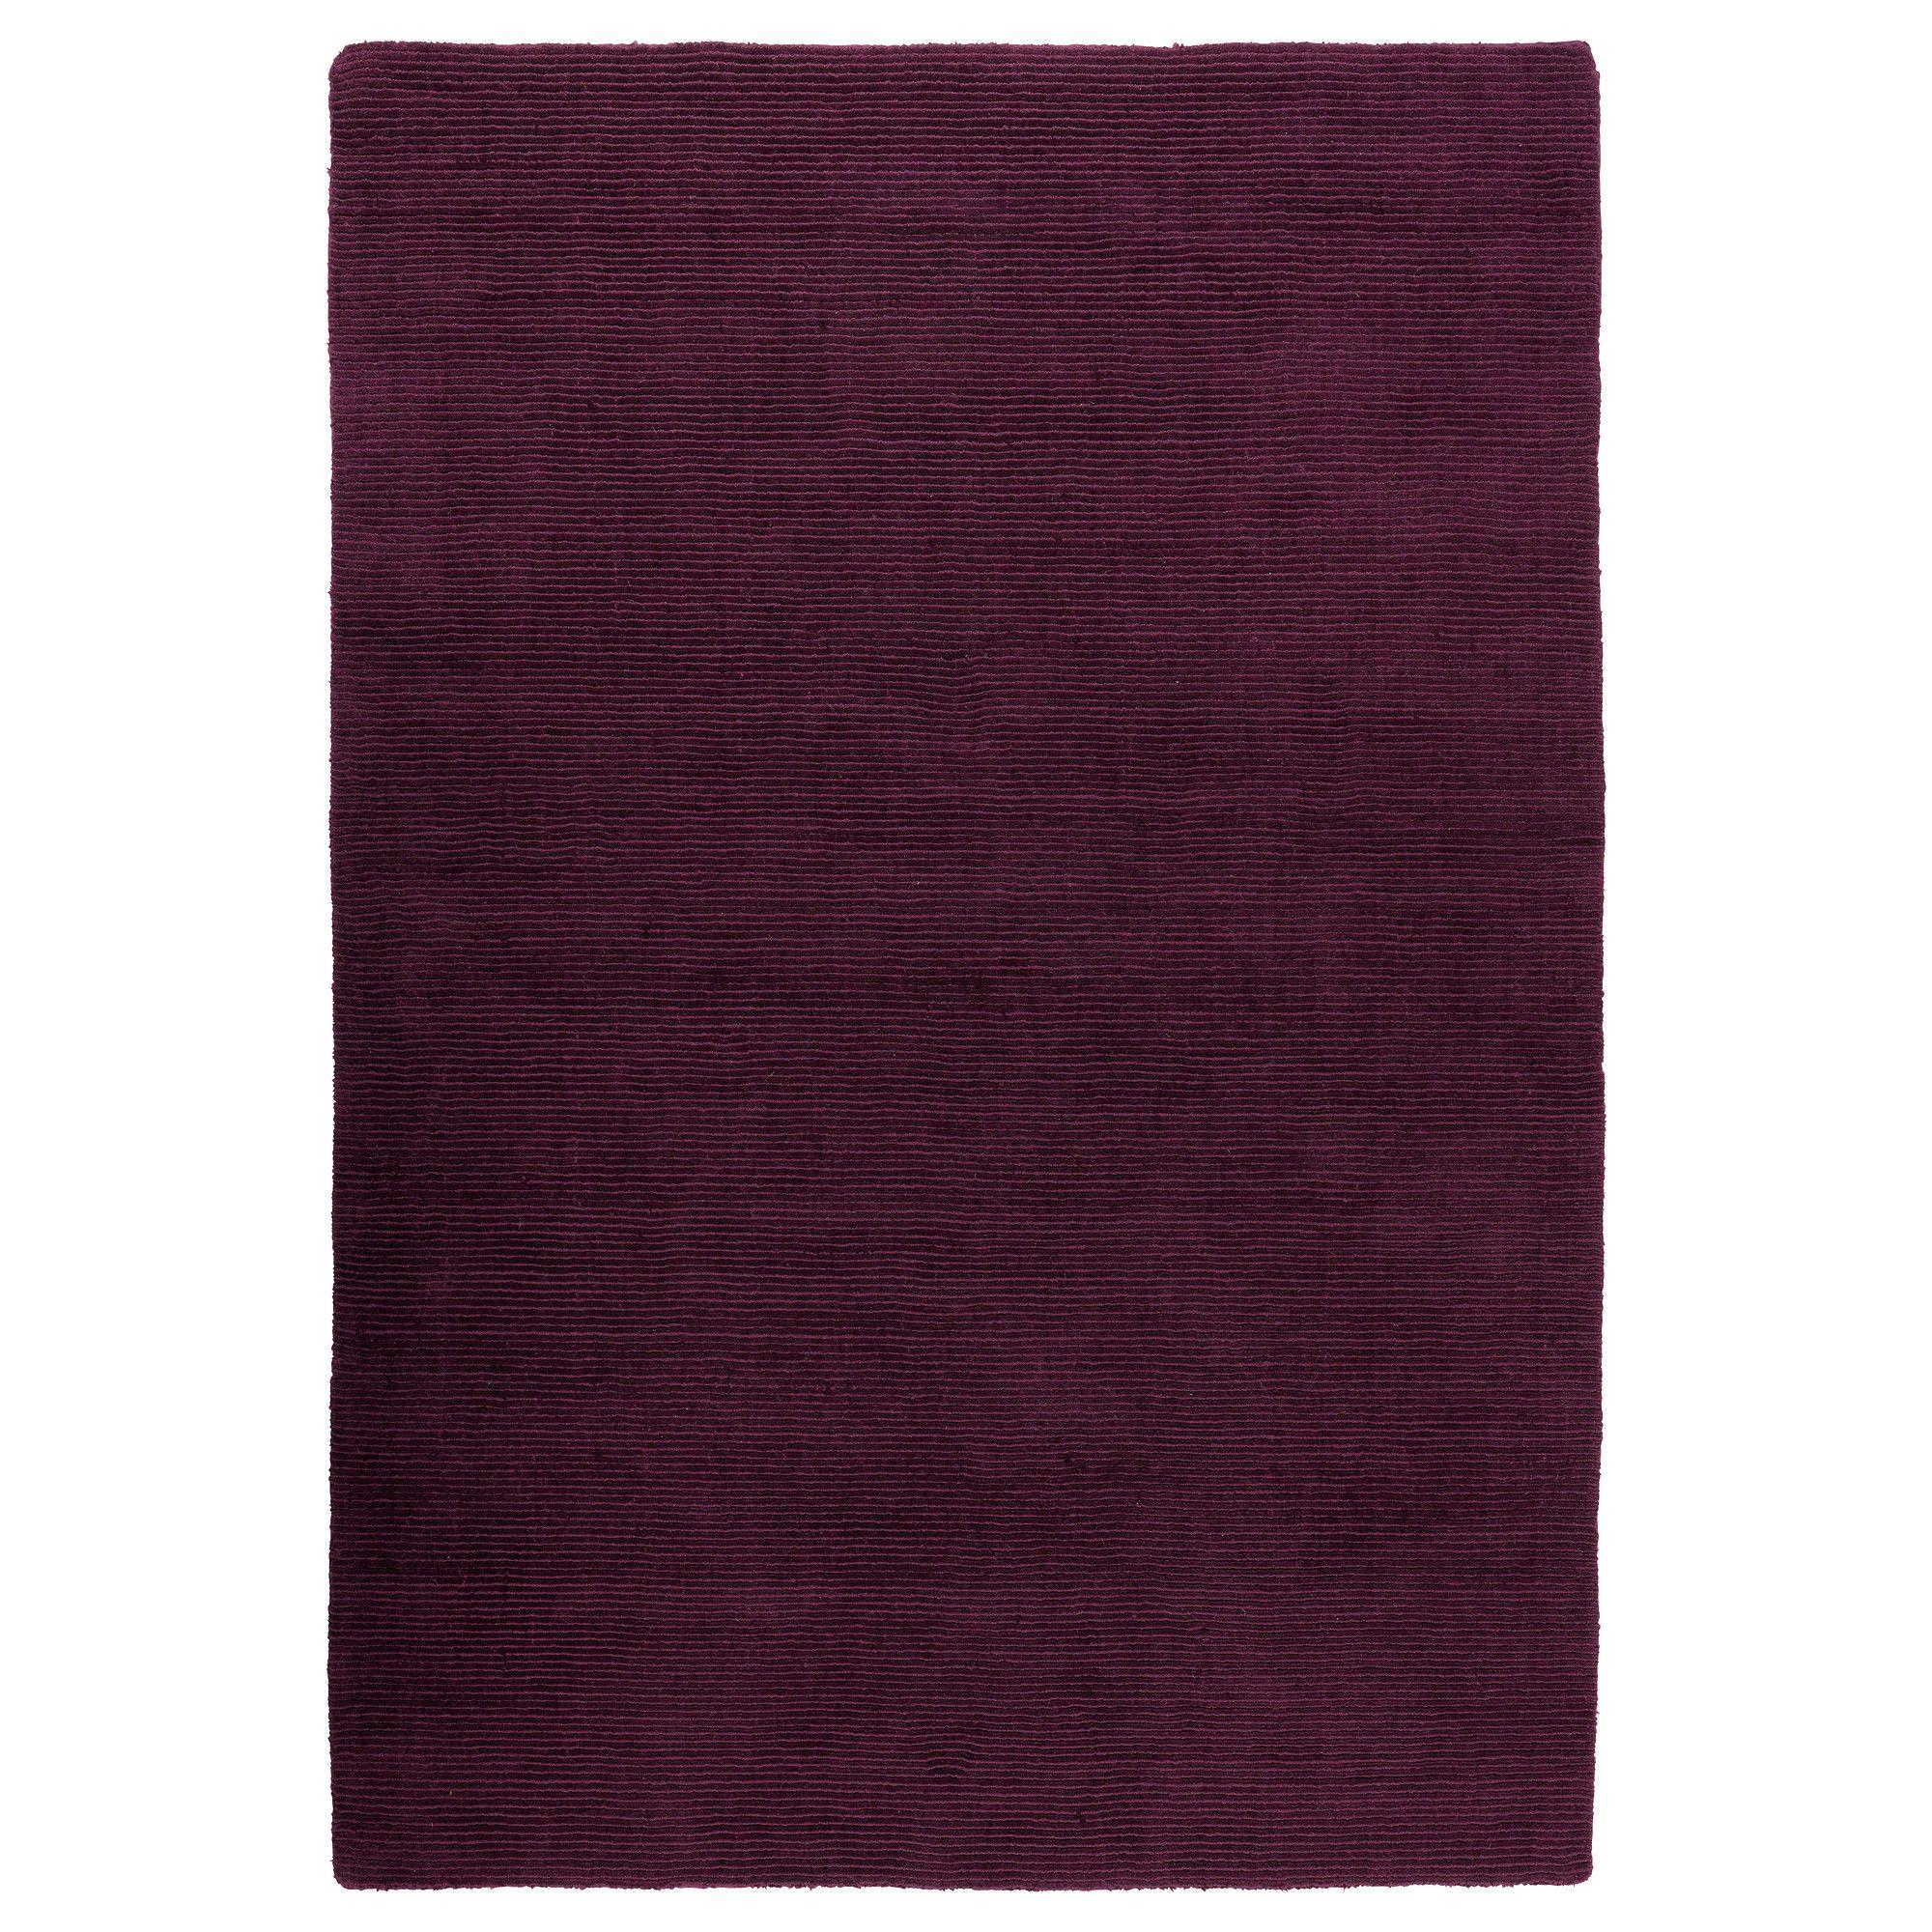 ALMSTED Teppe, kort lugg - 170x240 cm - IKEA